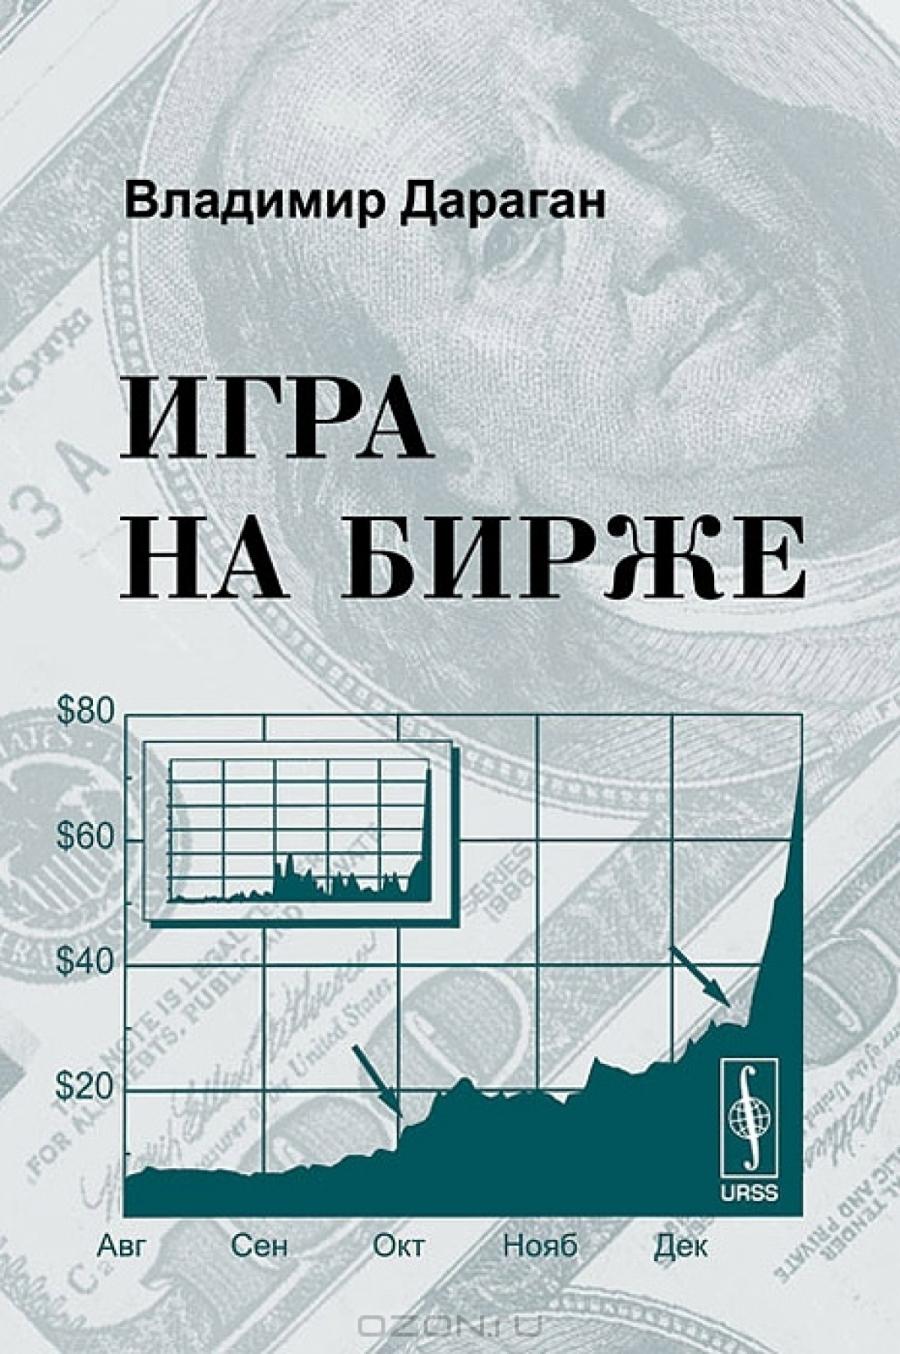 Обложка книги:  владимир дараган - игра на бирже